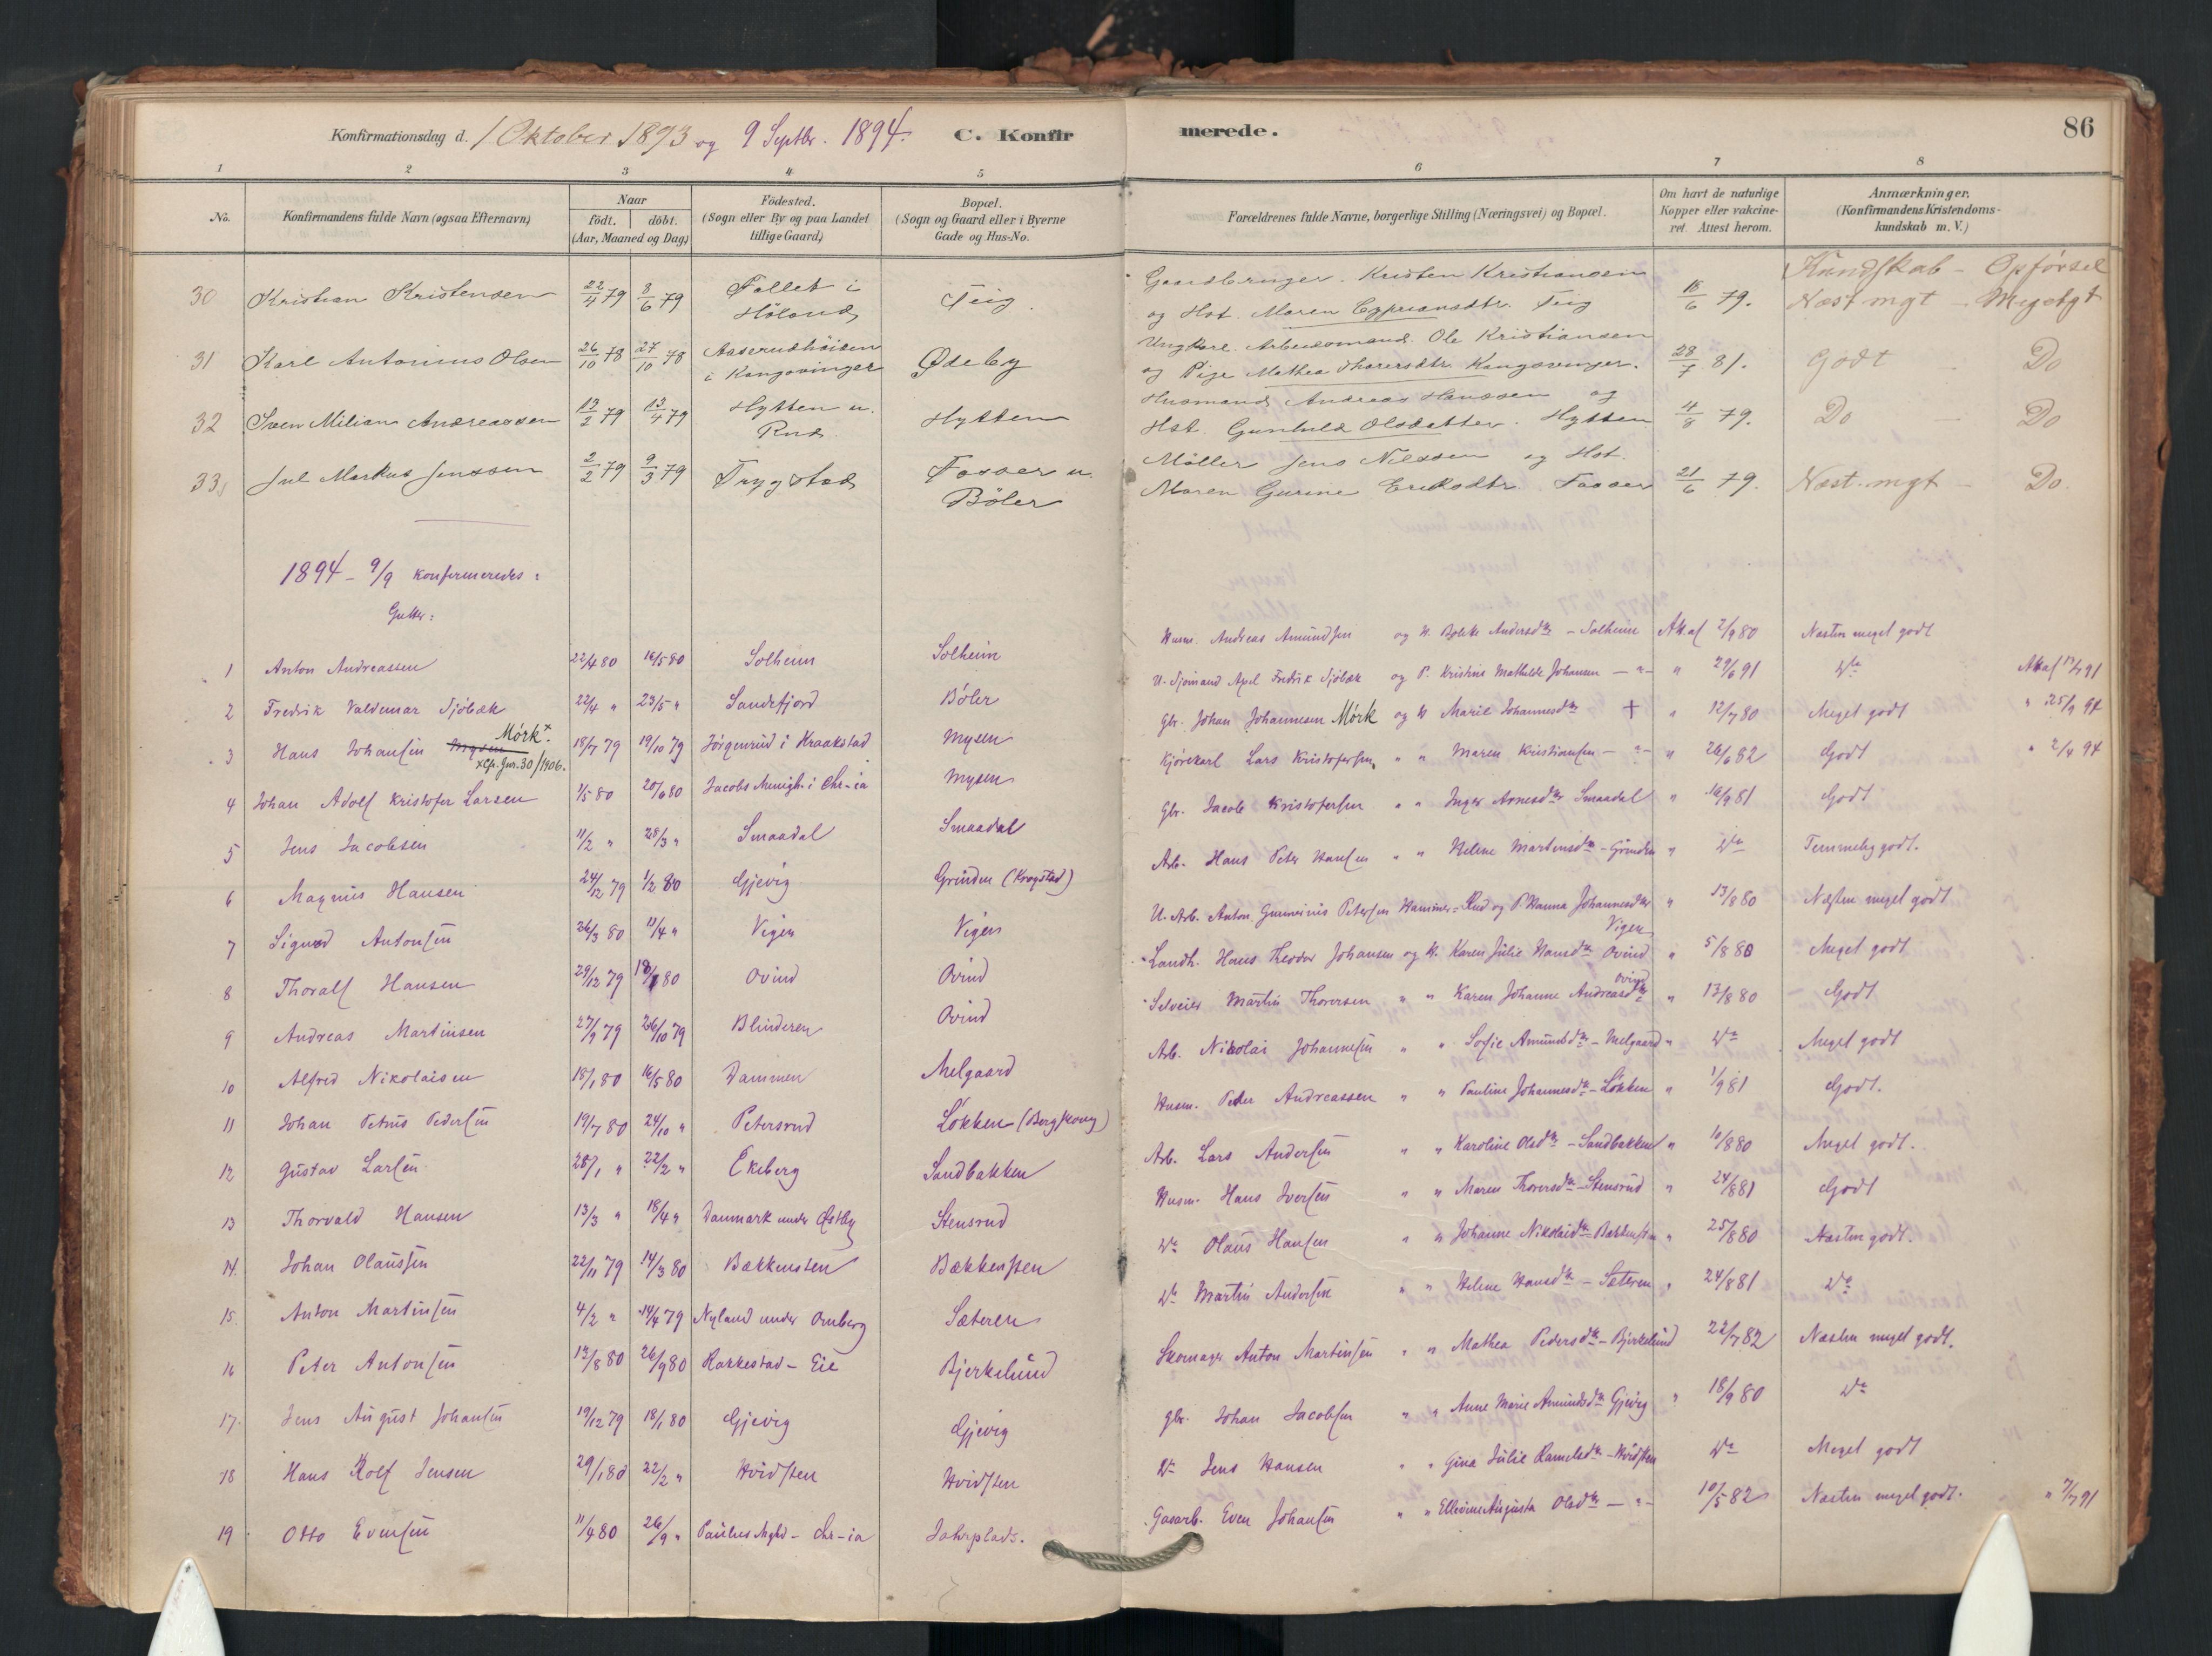 SAO, Enebakk prestekontor Kirkebøker, F/Fa/L0018: Ministerialbok nr. I 18, 1877-1930, s. 86